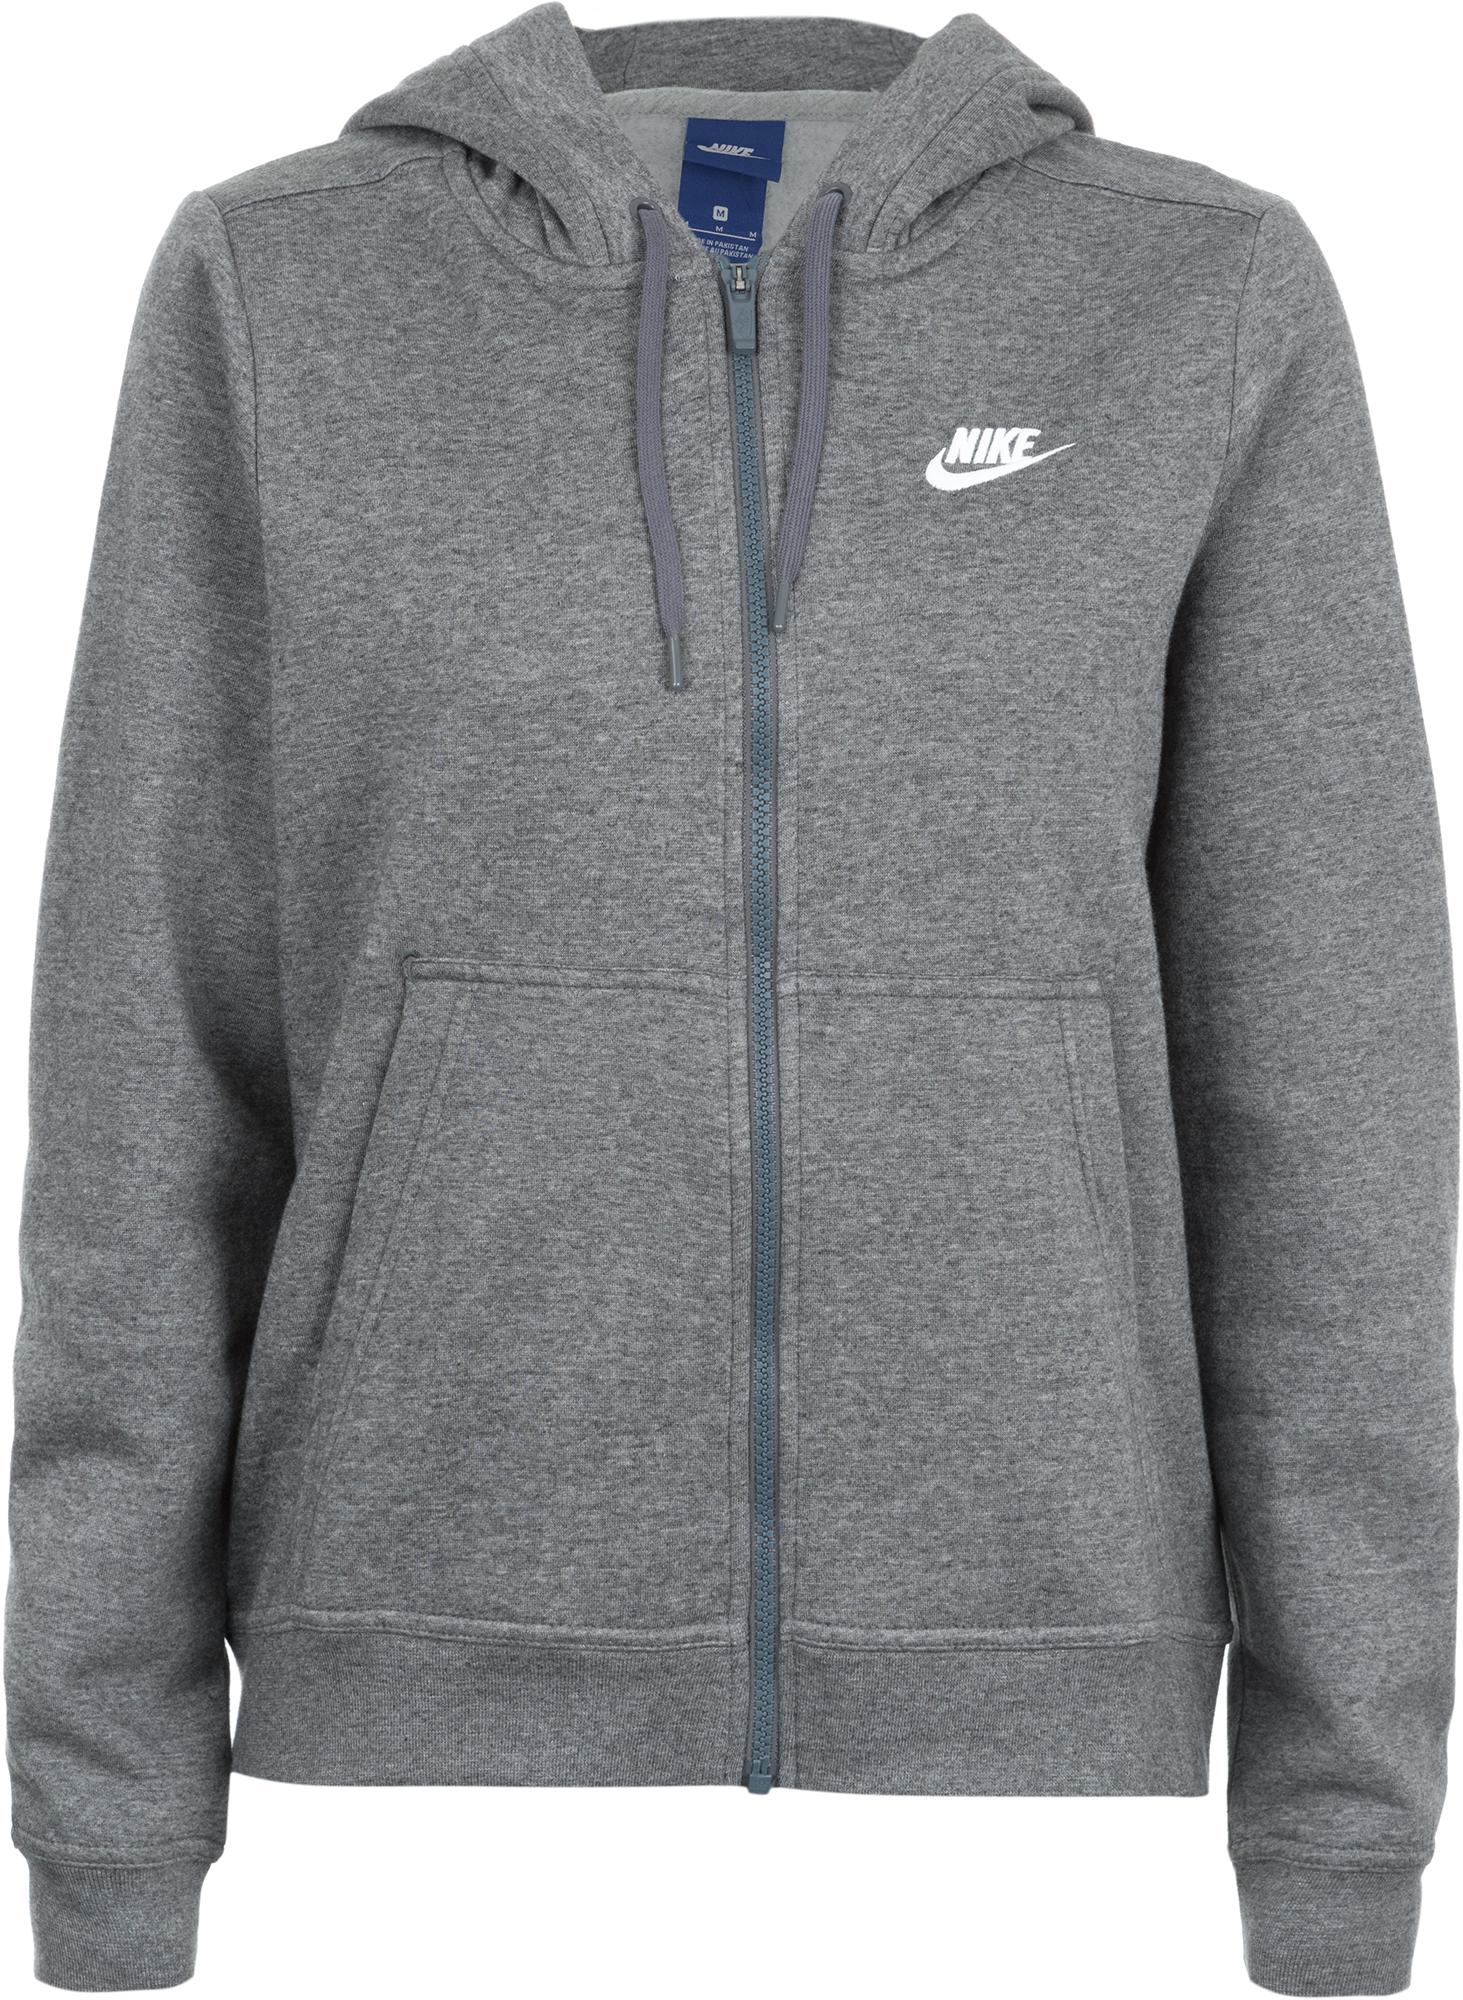 Nike Джемпер женский Nike Sportswear, размер 48-50 стоимость